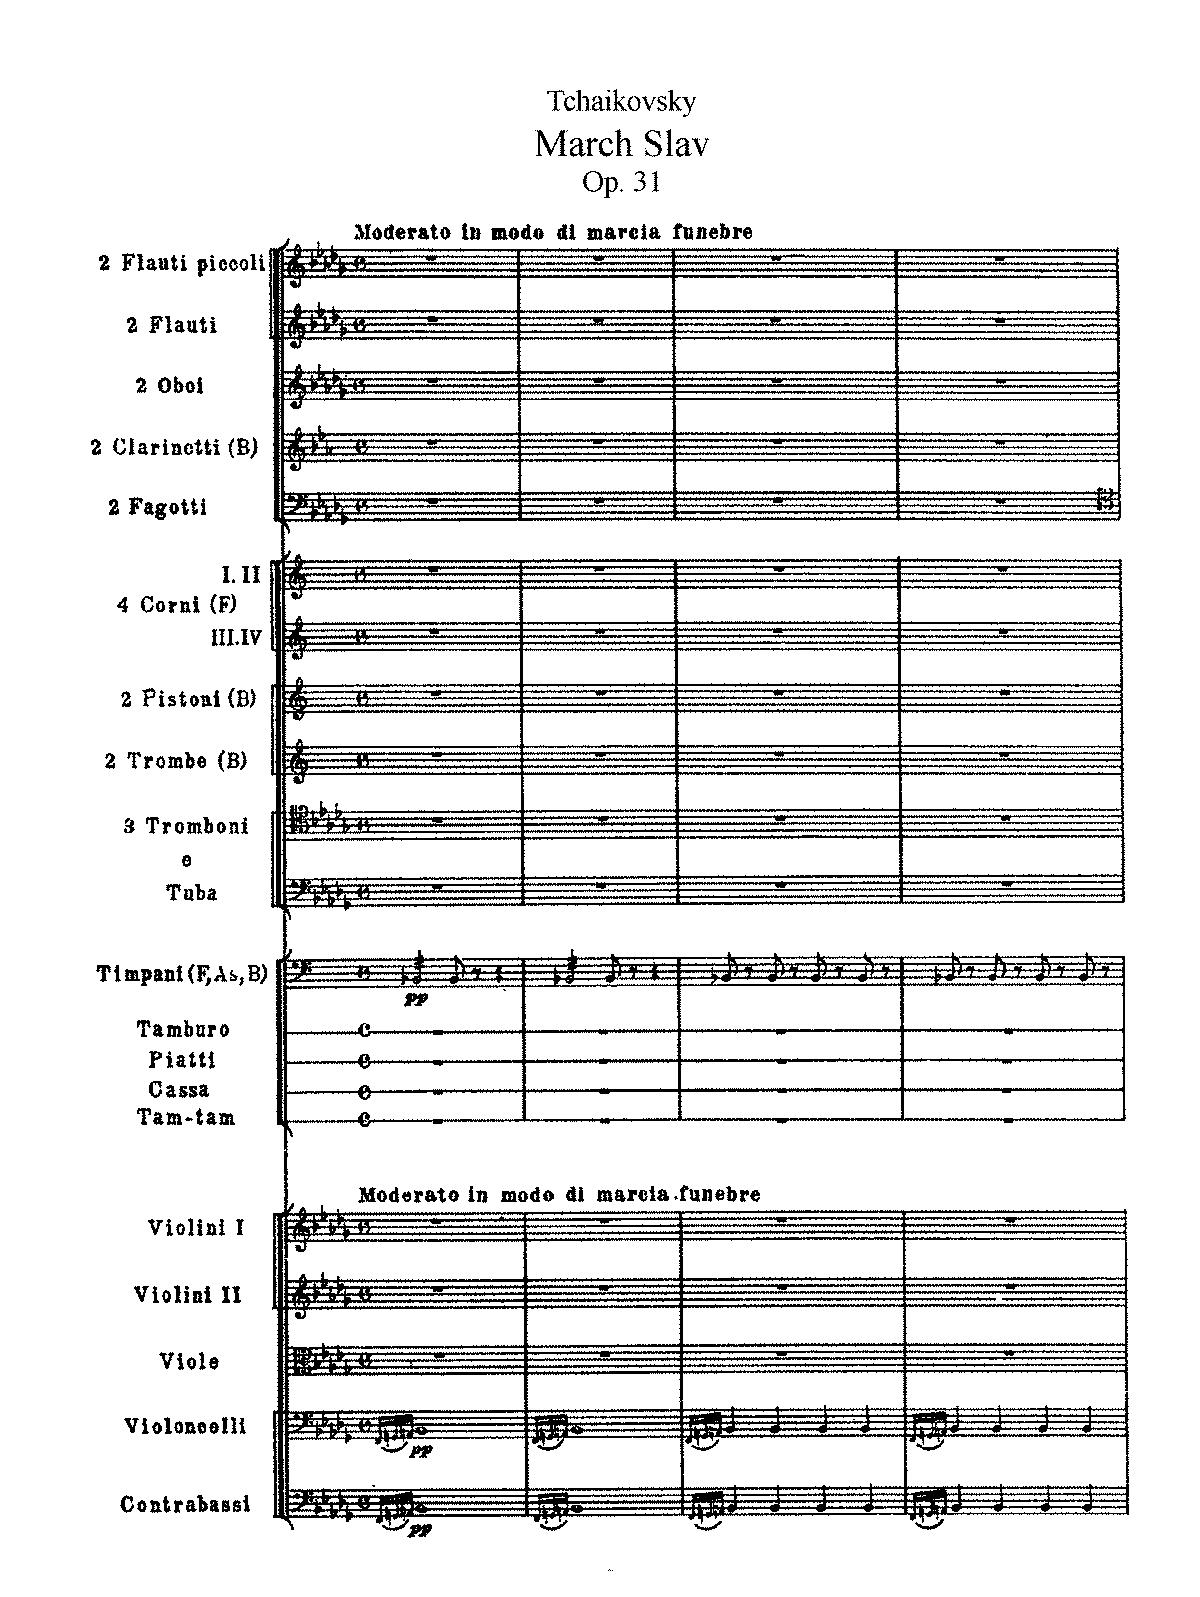 Čajkovskij, op. 31